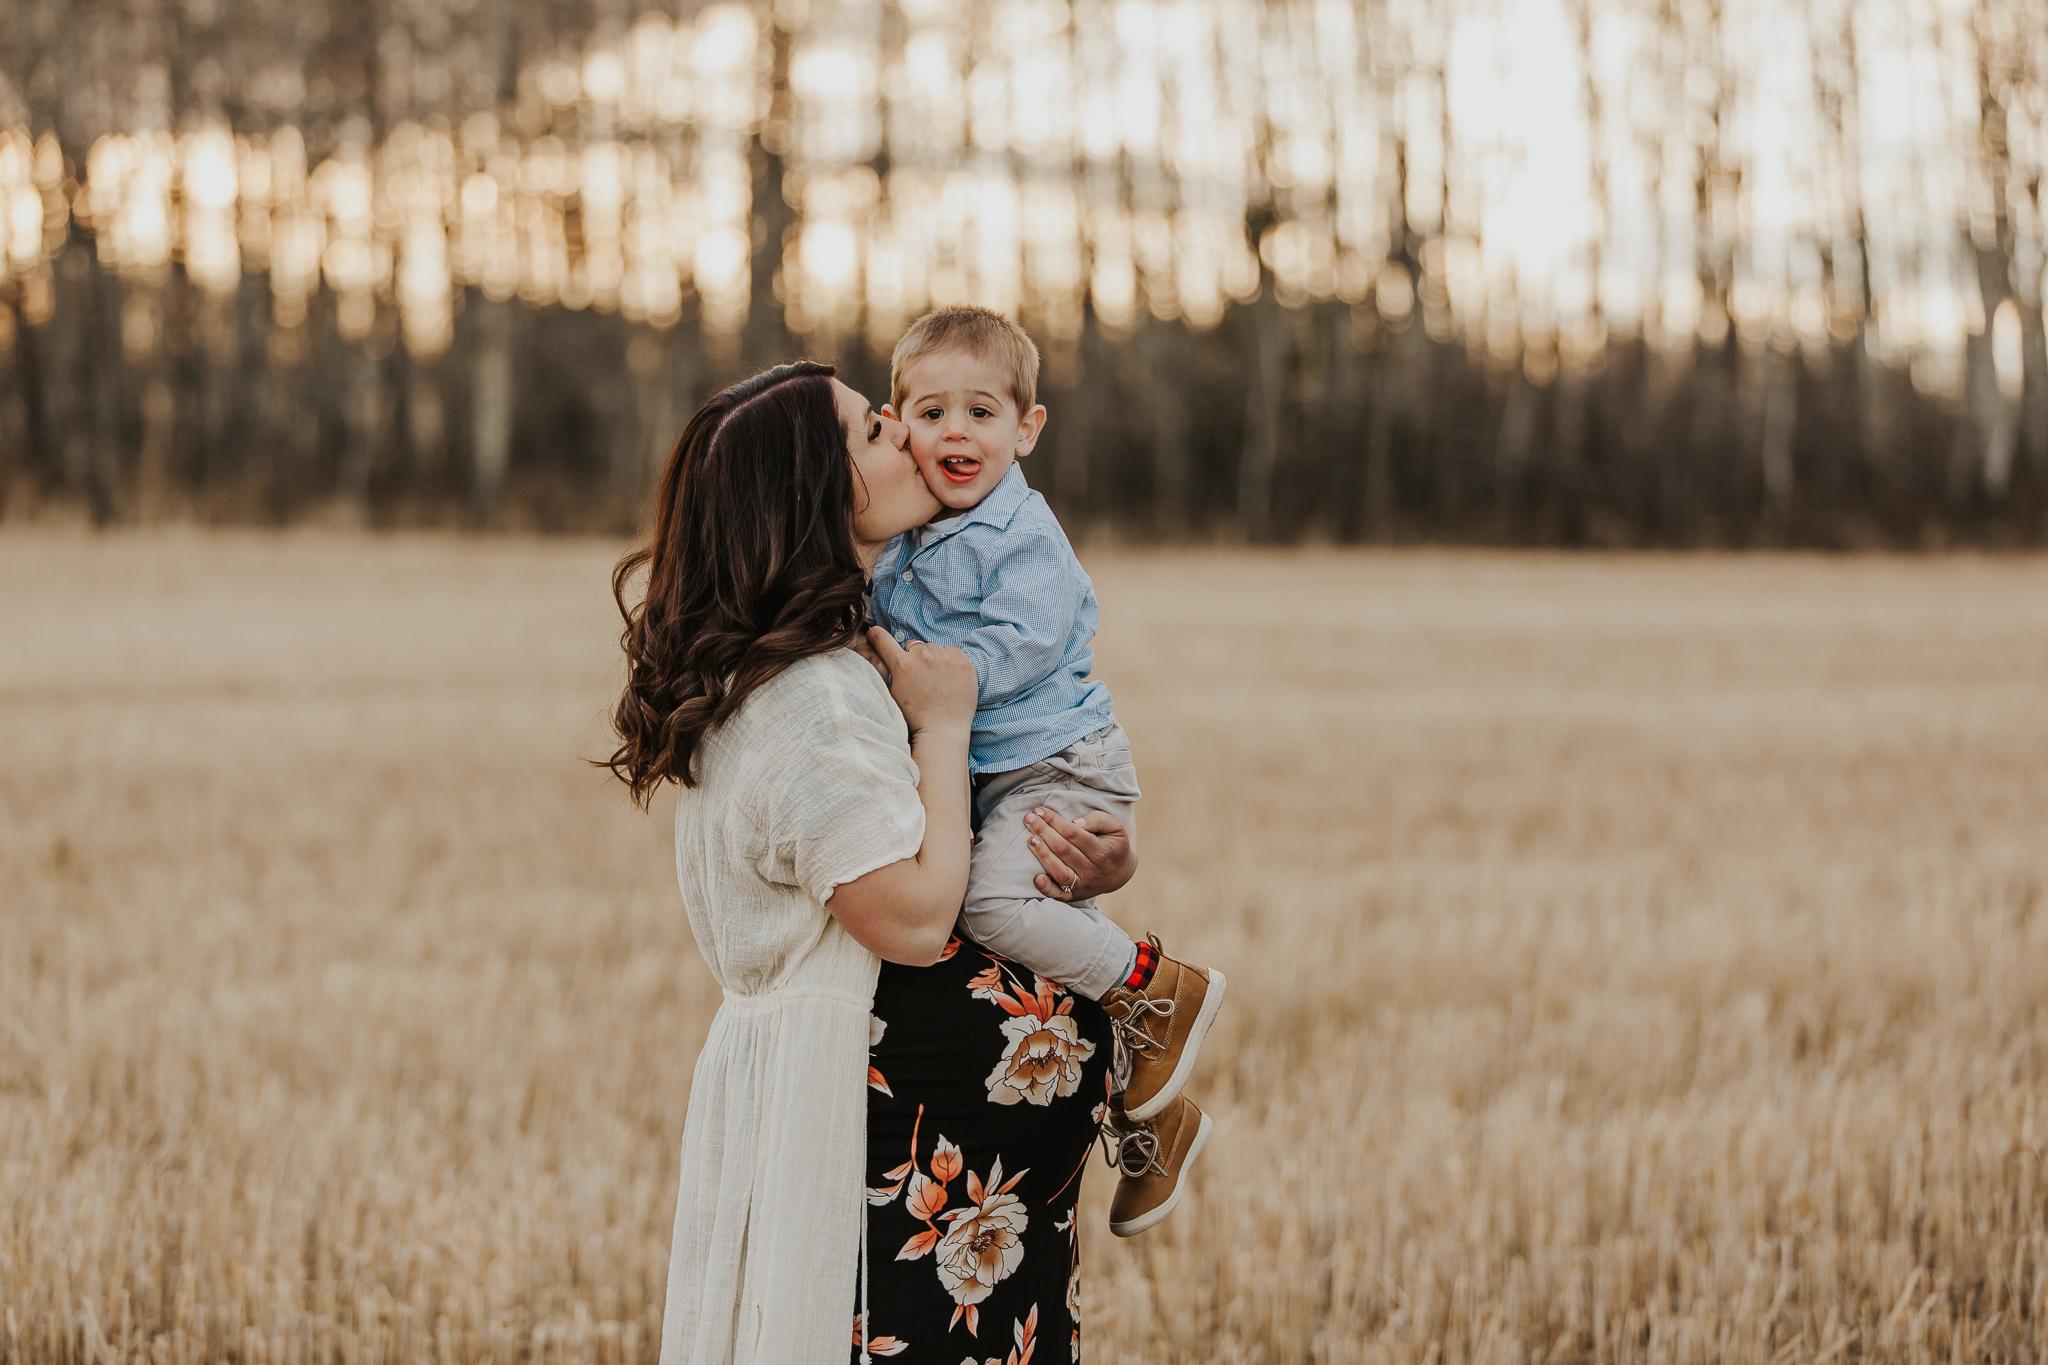 Alina-Joy-Photography-Cold-Lake-Maternity-Photographer-Josee-7.jpg